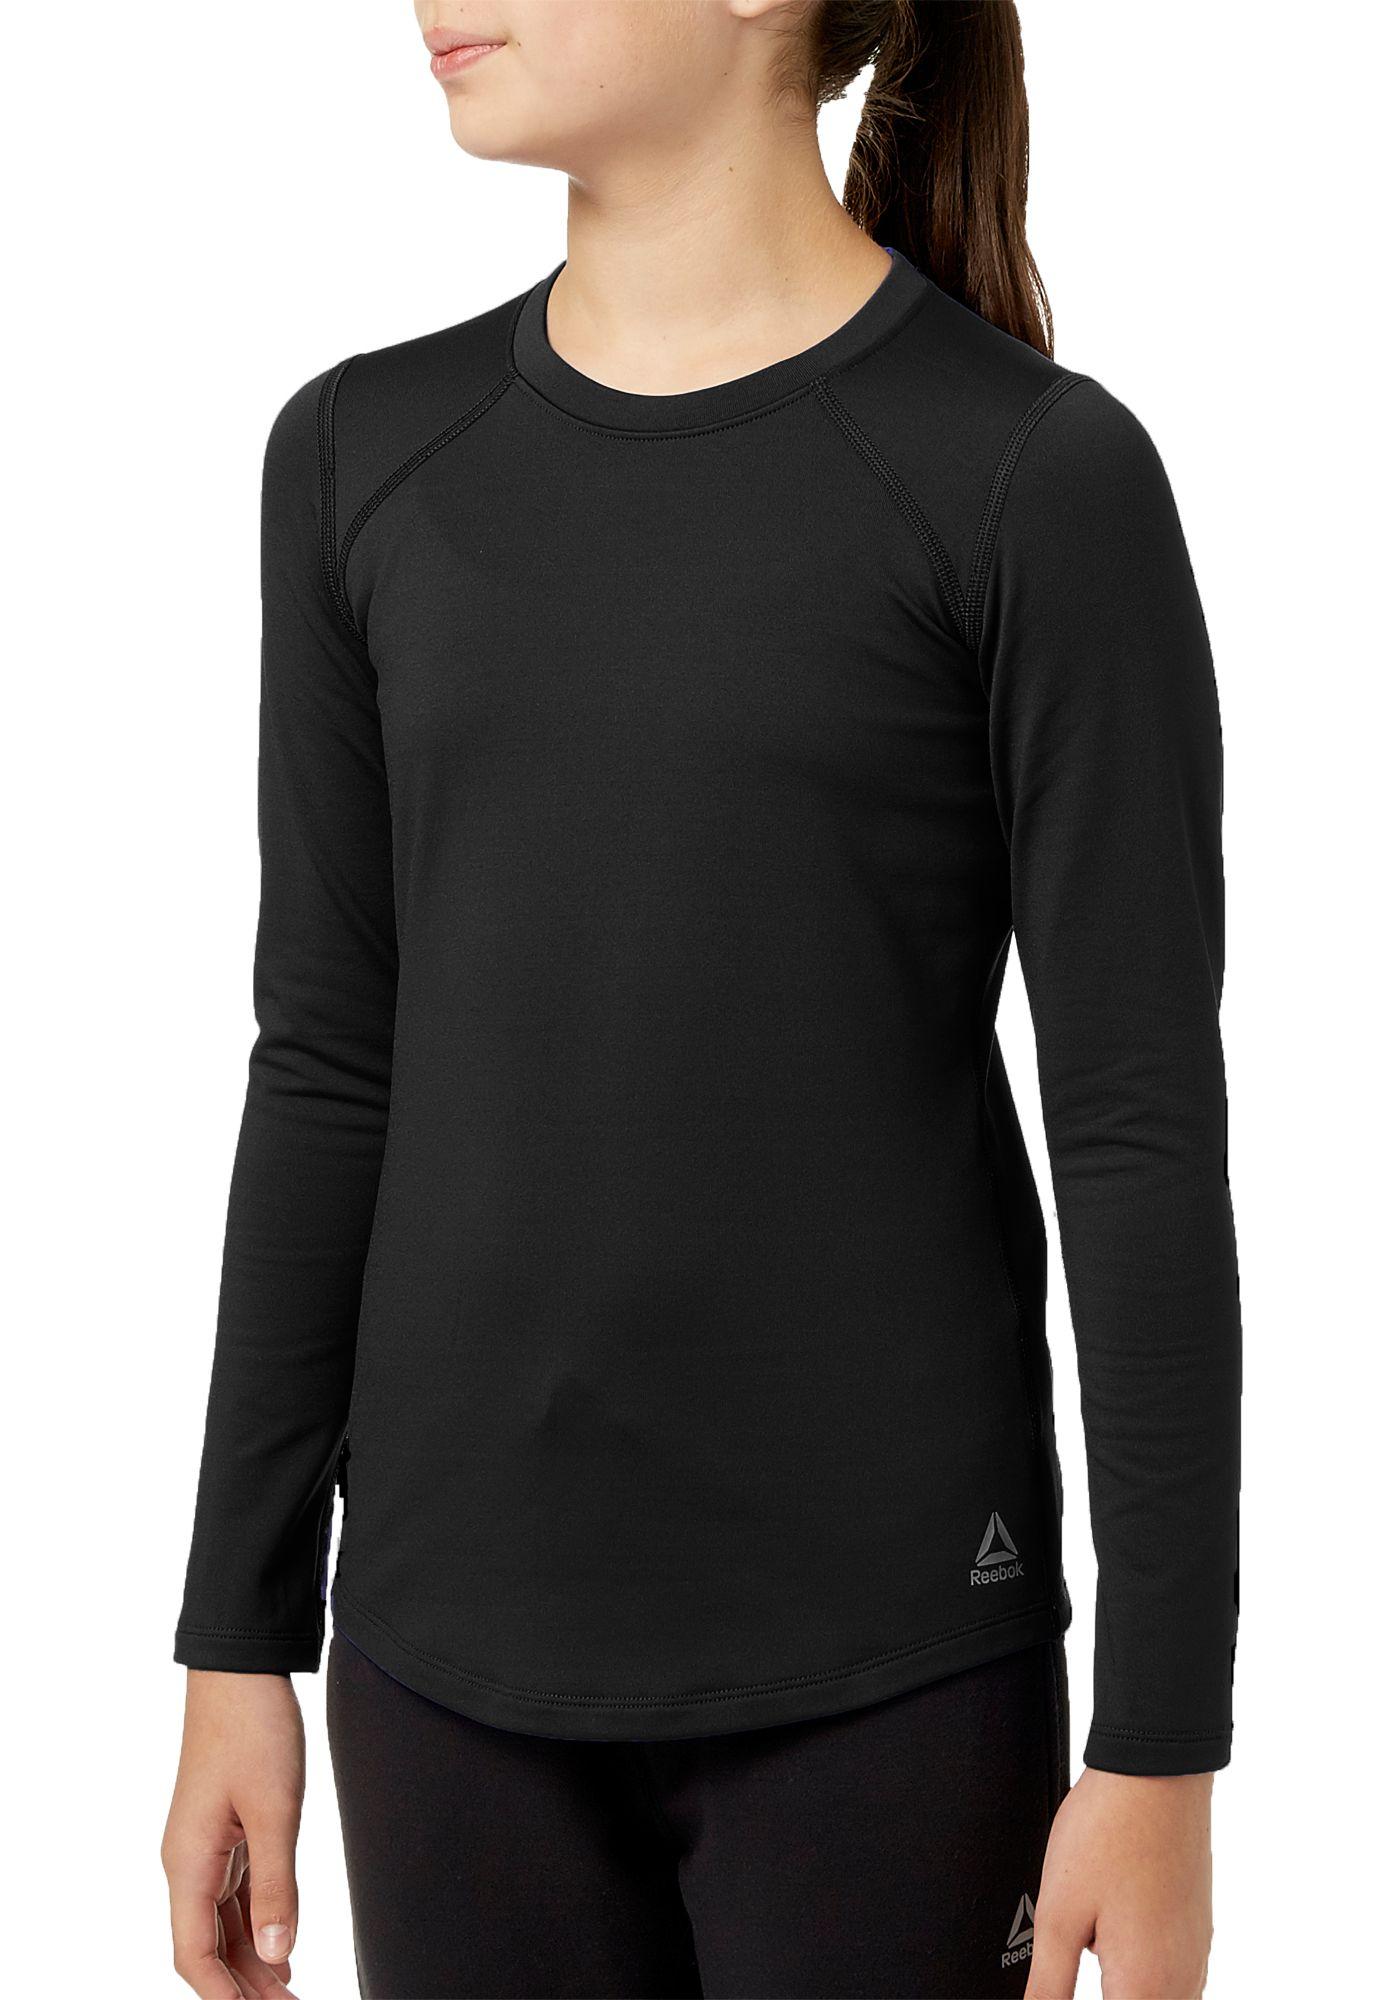 Reebok Girls Cold Weather Compression Crewneck Long Sleeve Shirt